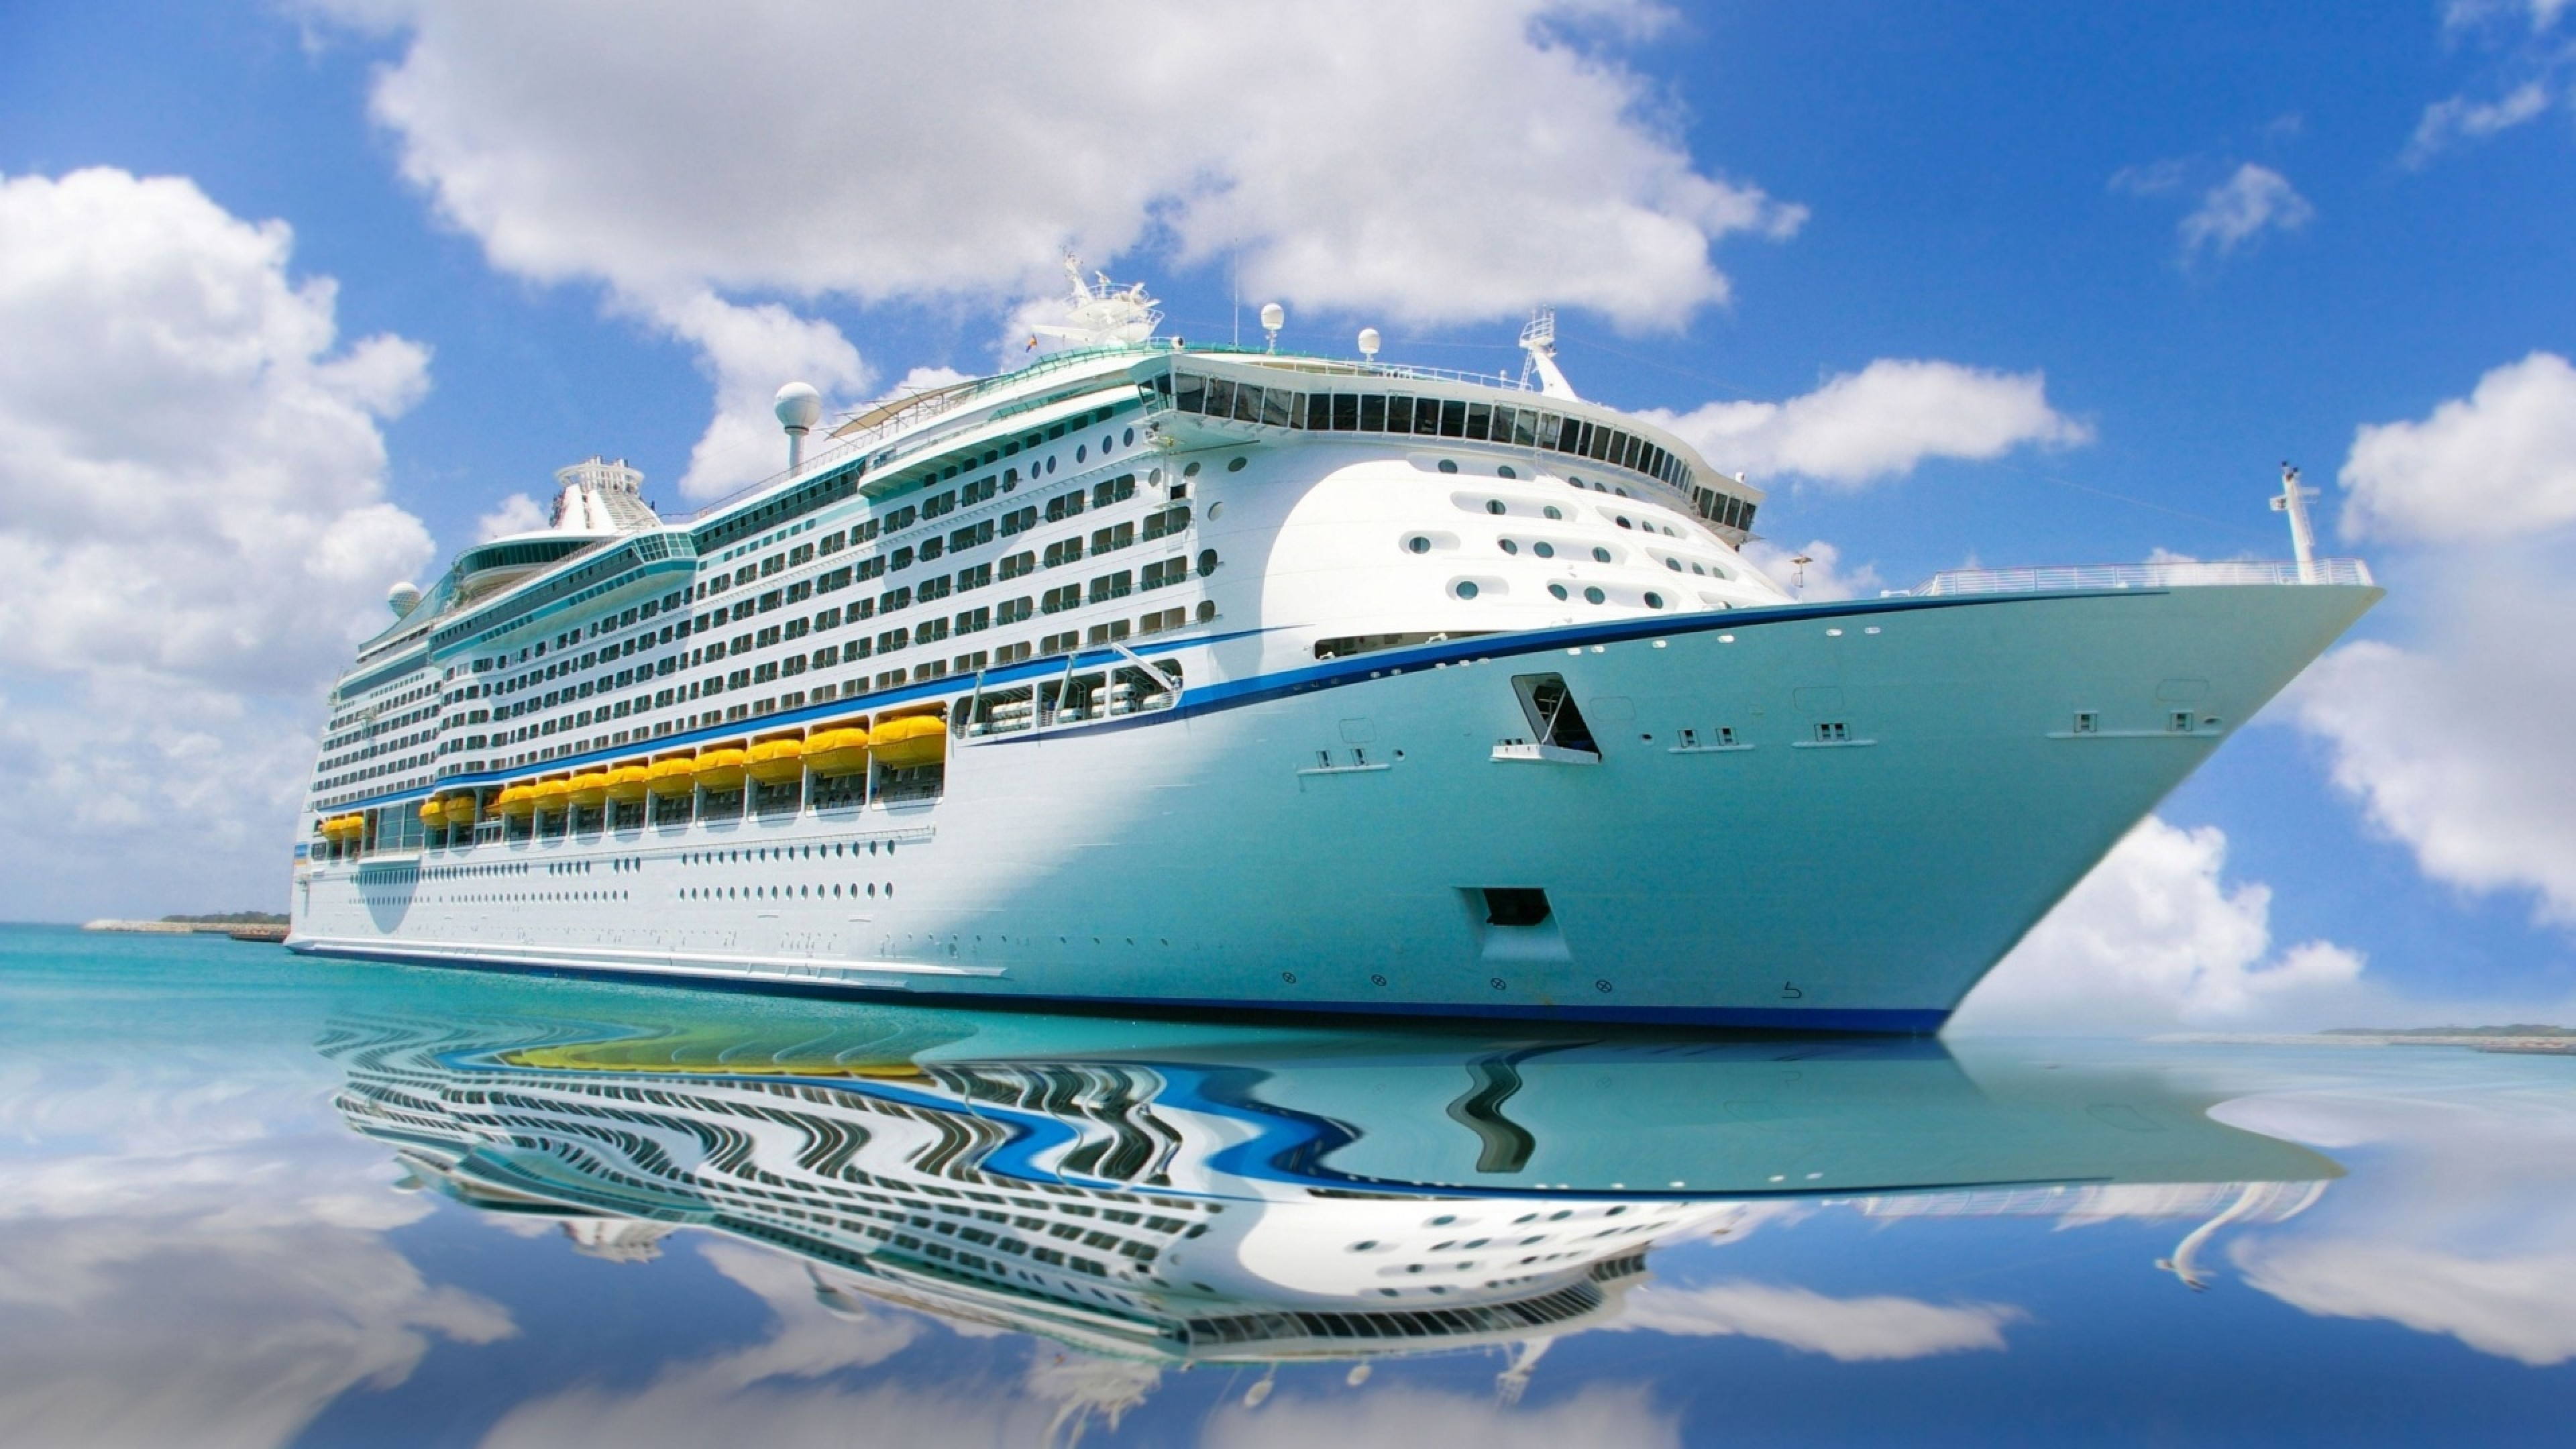 Hd Wallpaper Big Cruise Ship Wallpapers Trend